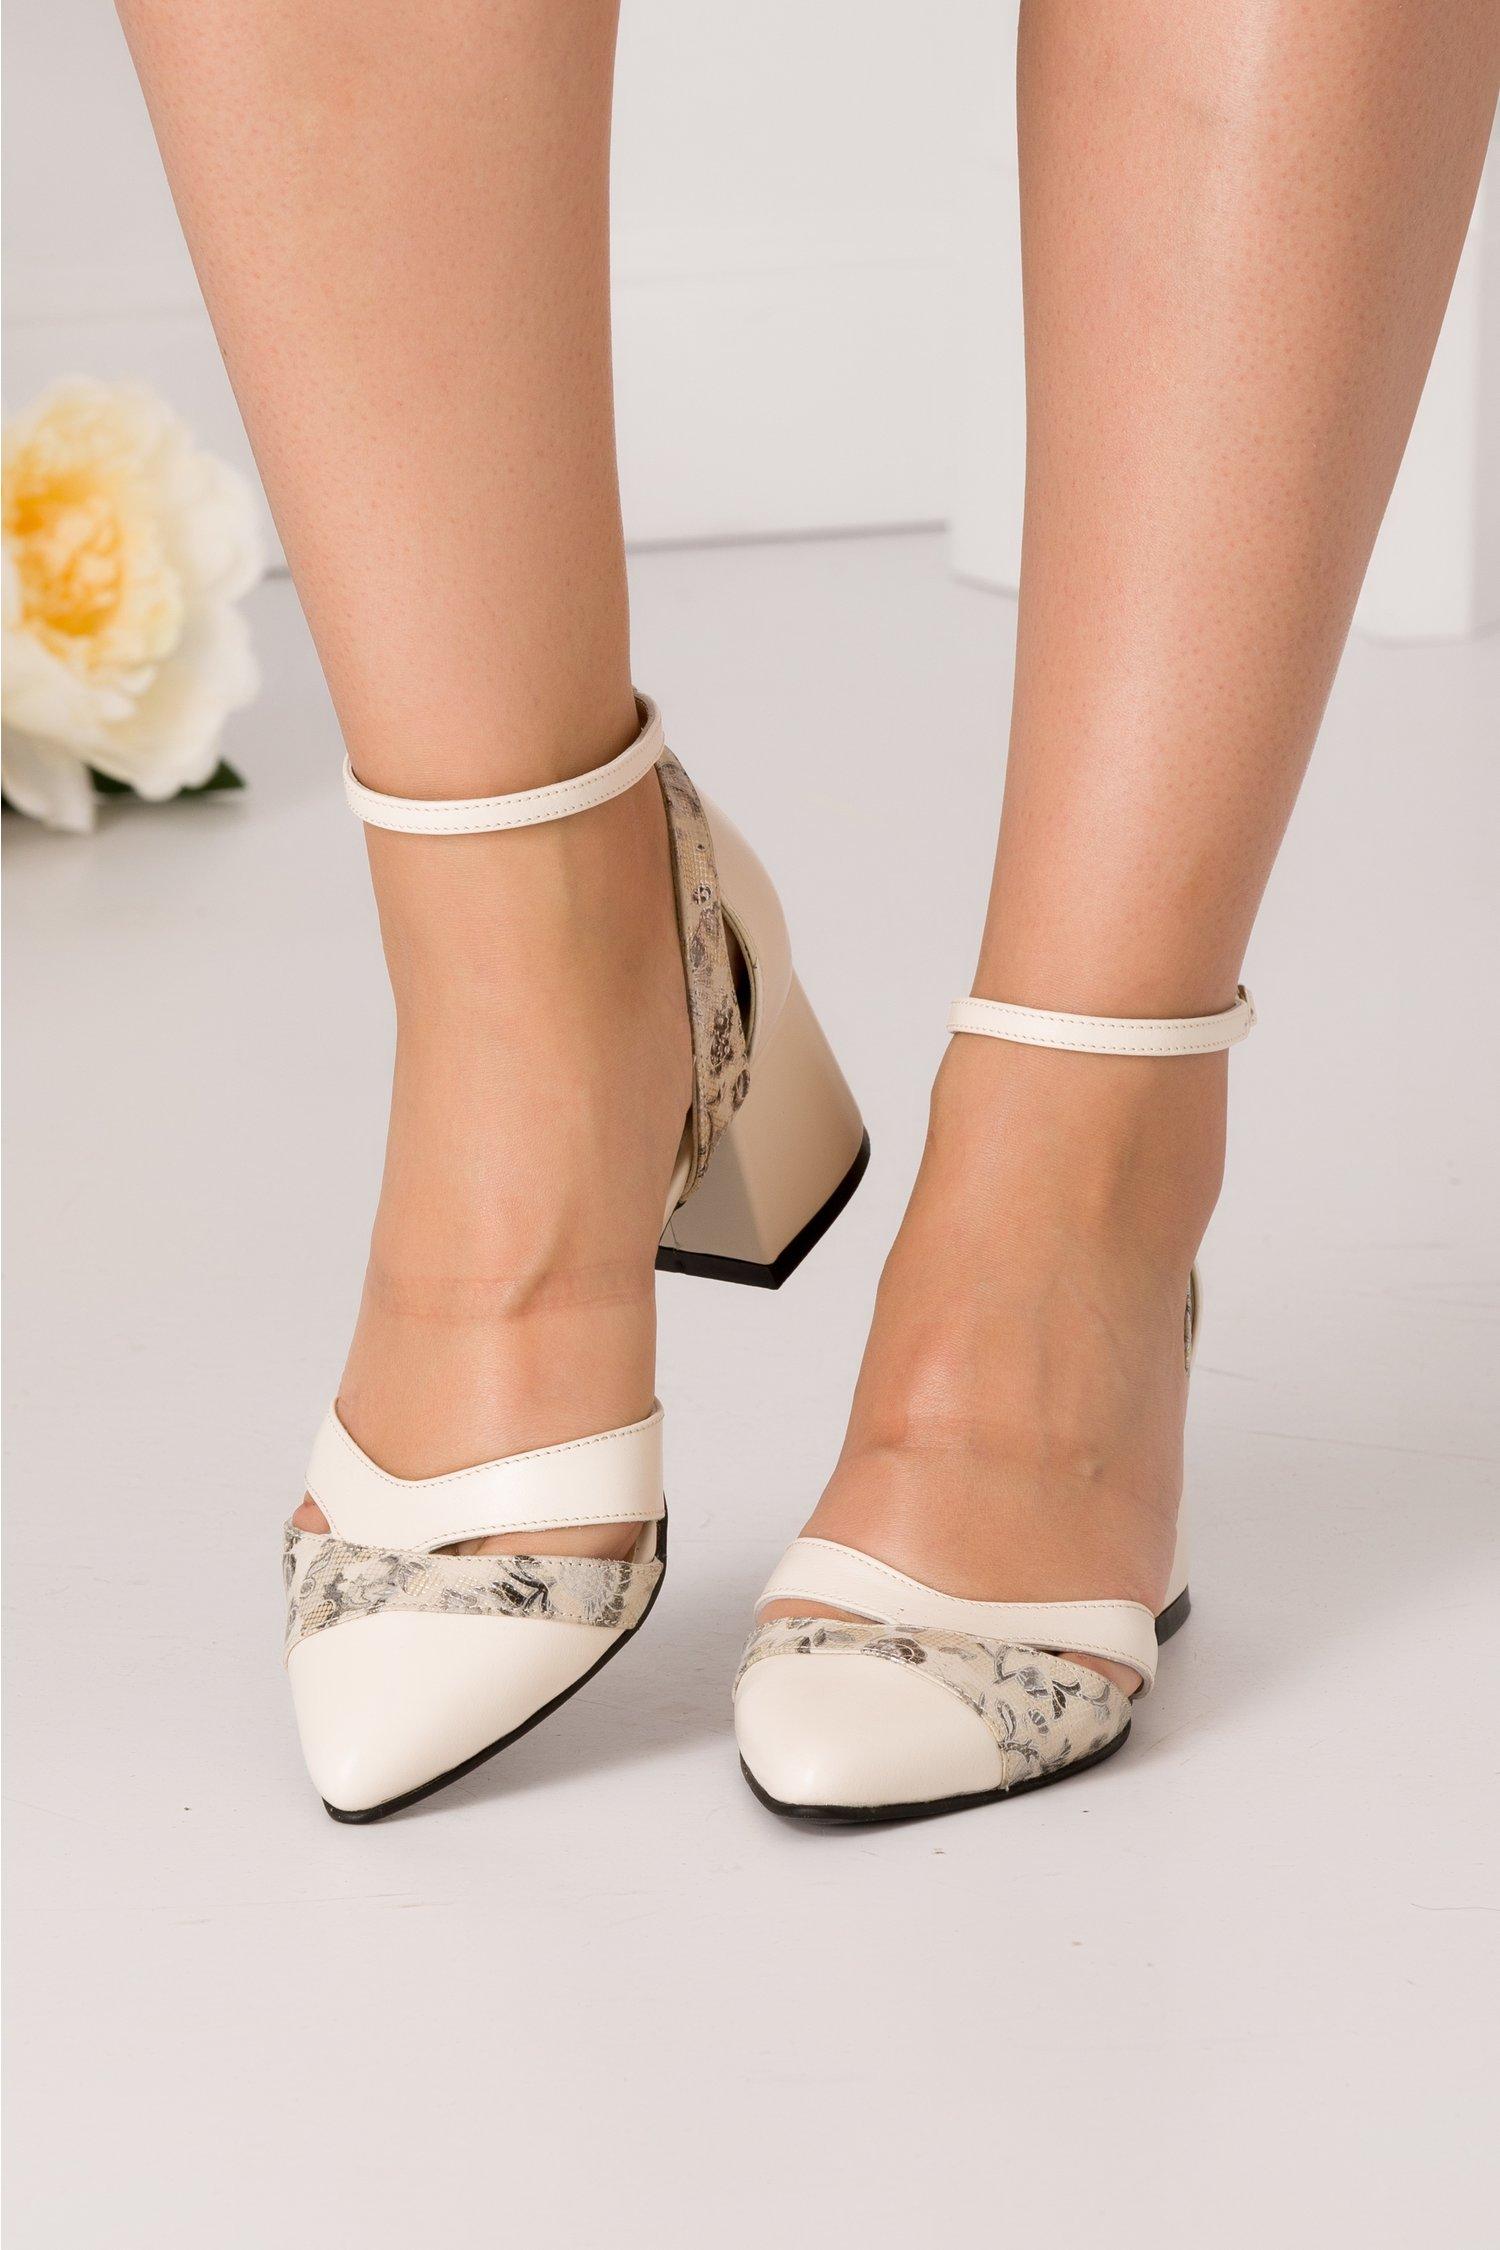 Pantofi decupati bej cu imprimeu floral